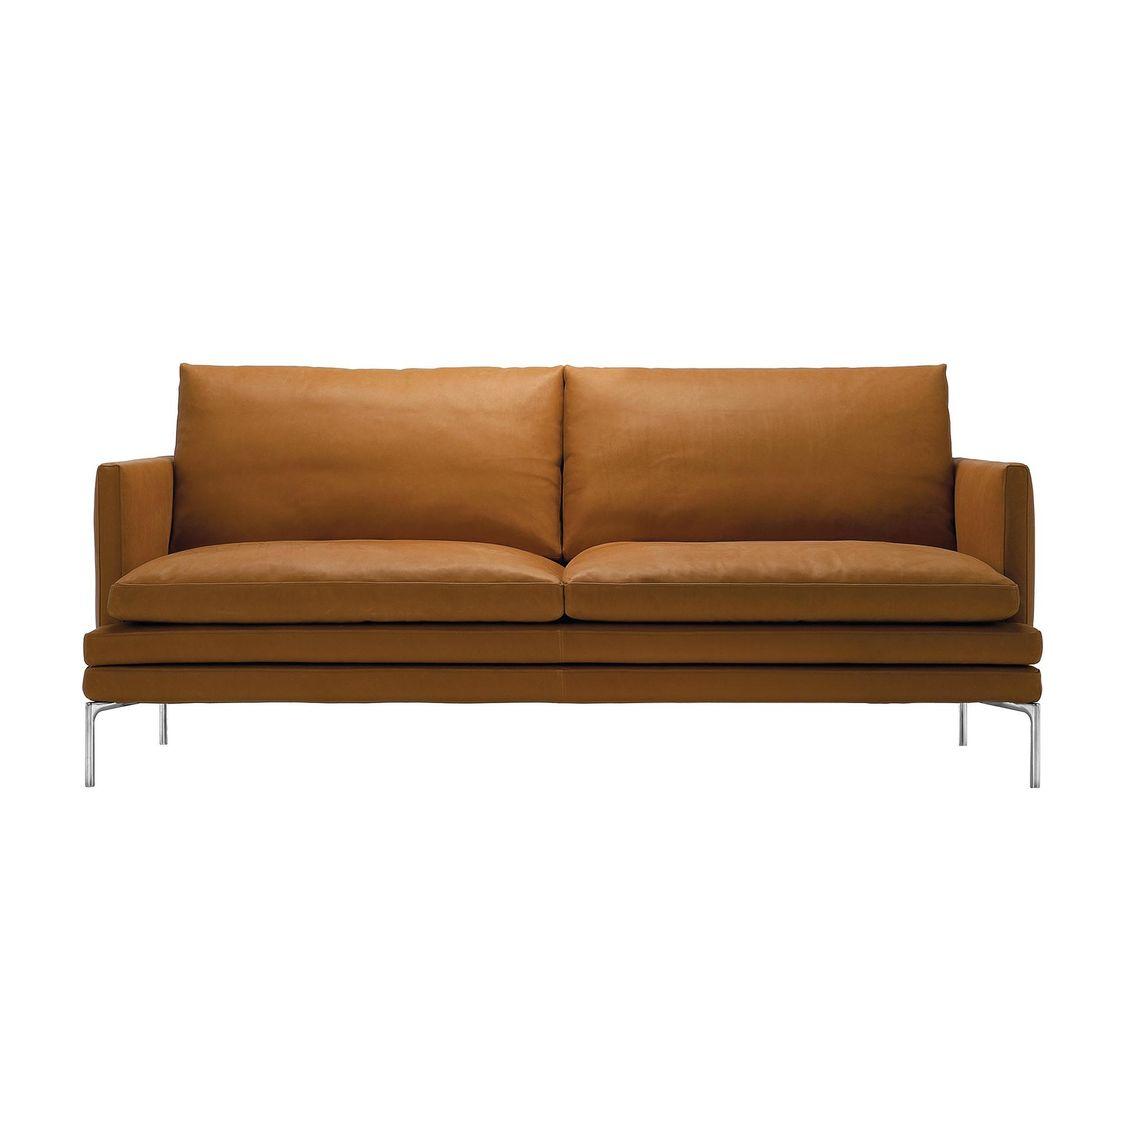 zanotta william canap 2 places avec coussin ambientedirect. Black Bedroom Furniture Sets. Home Design Ideas